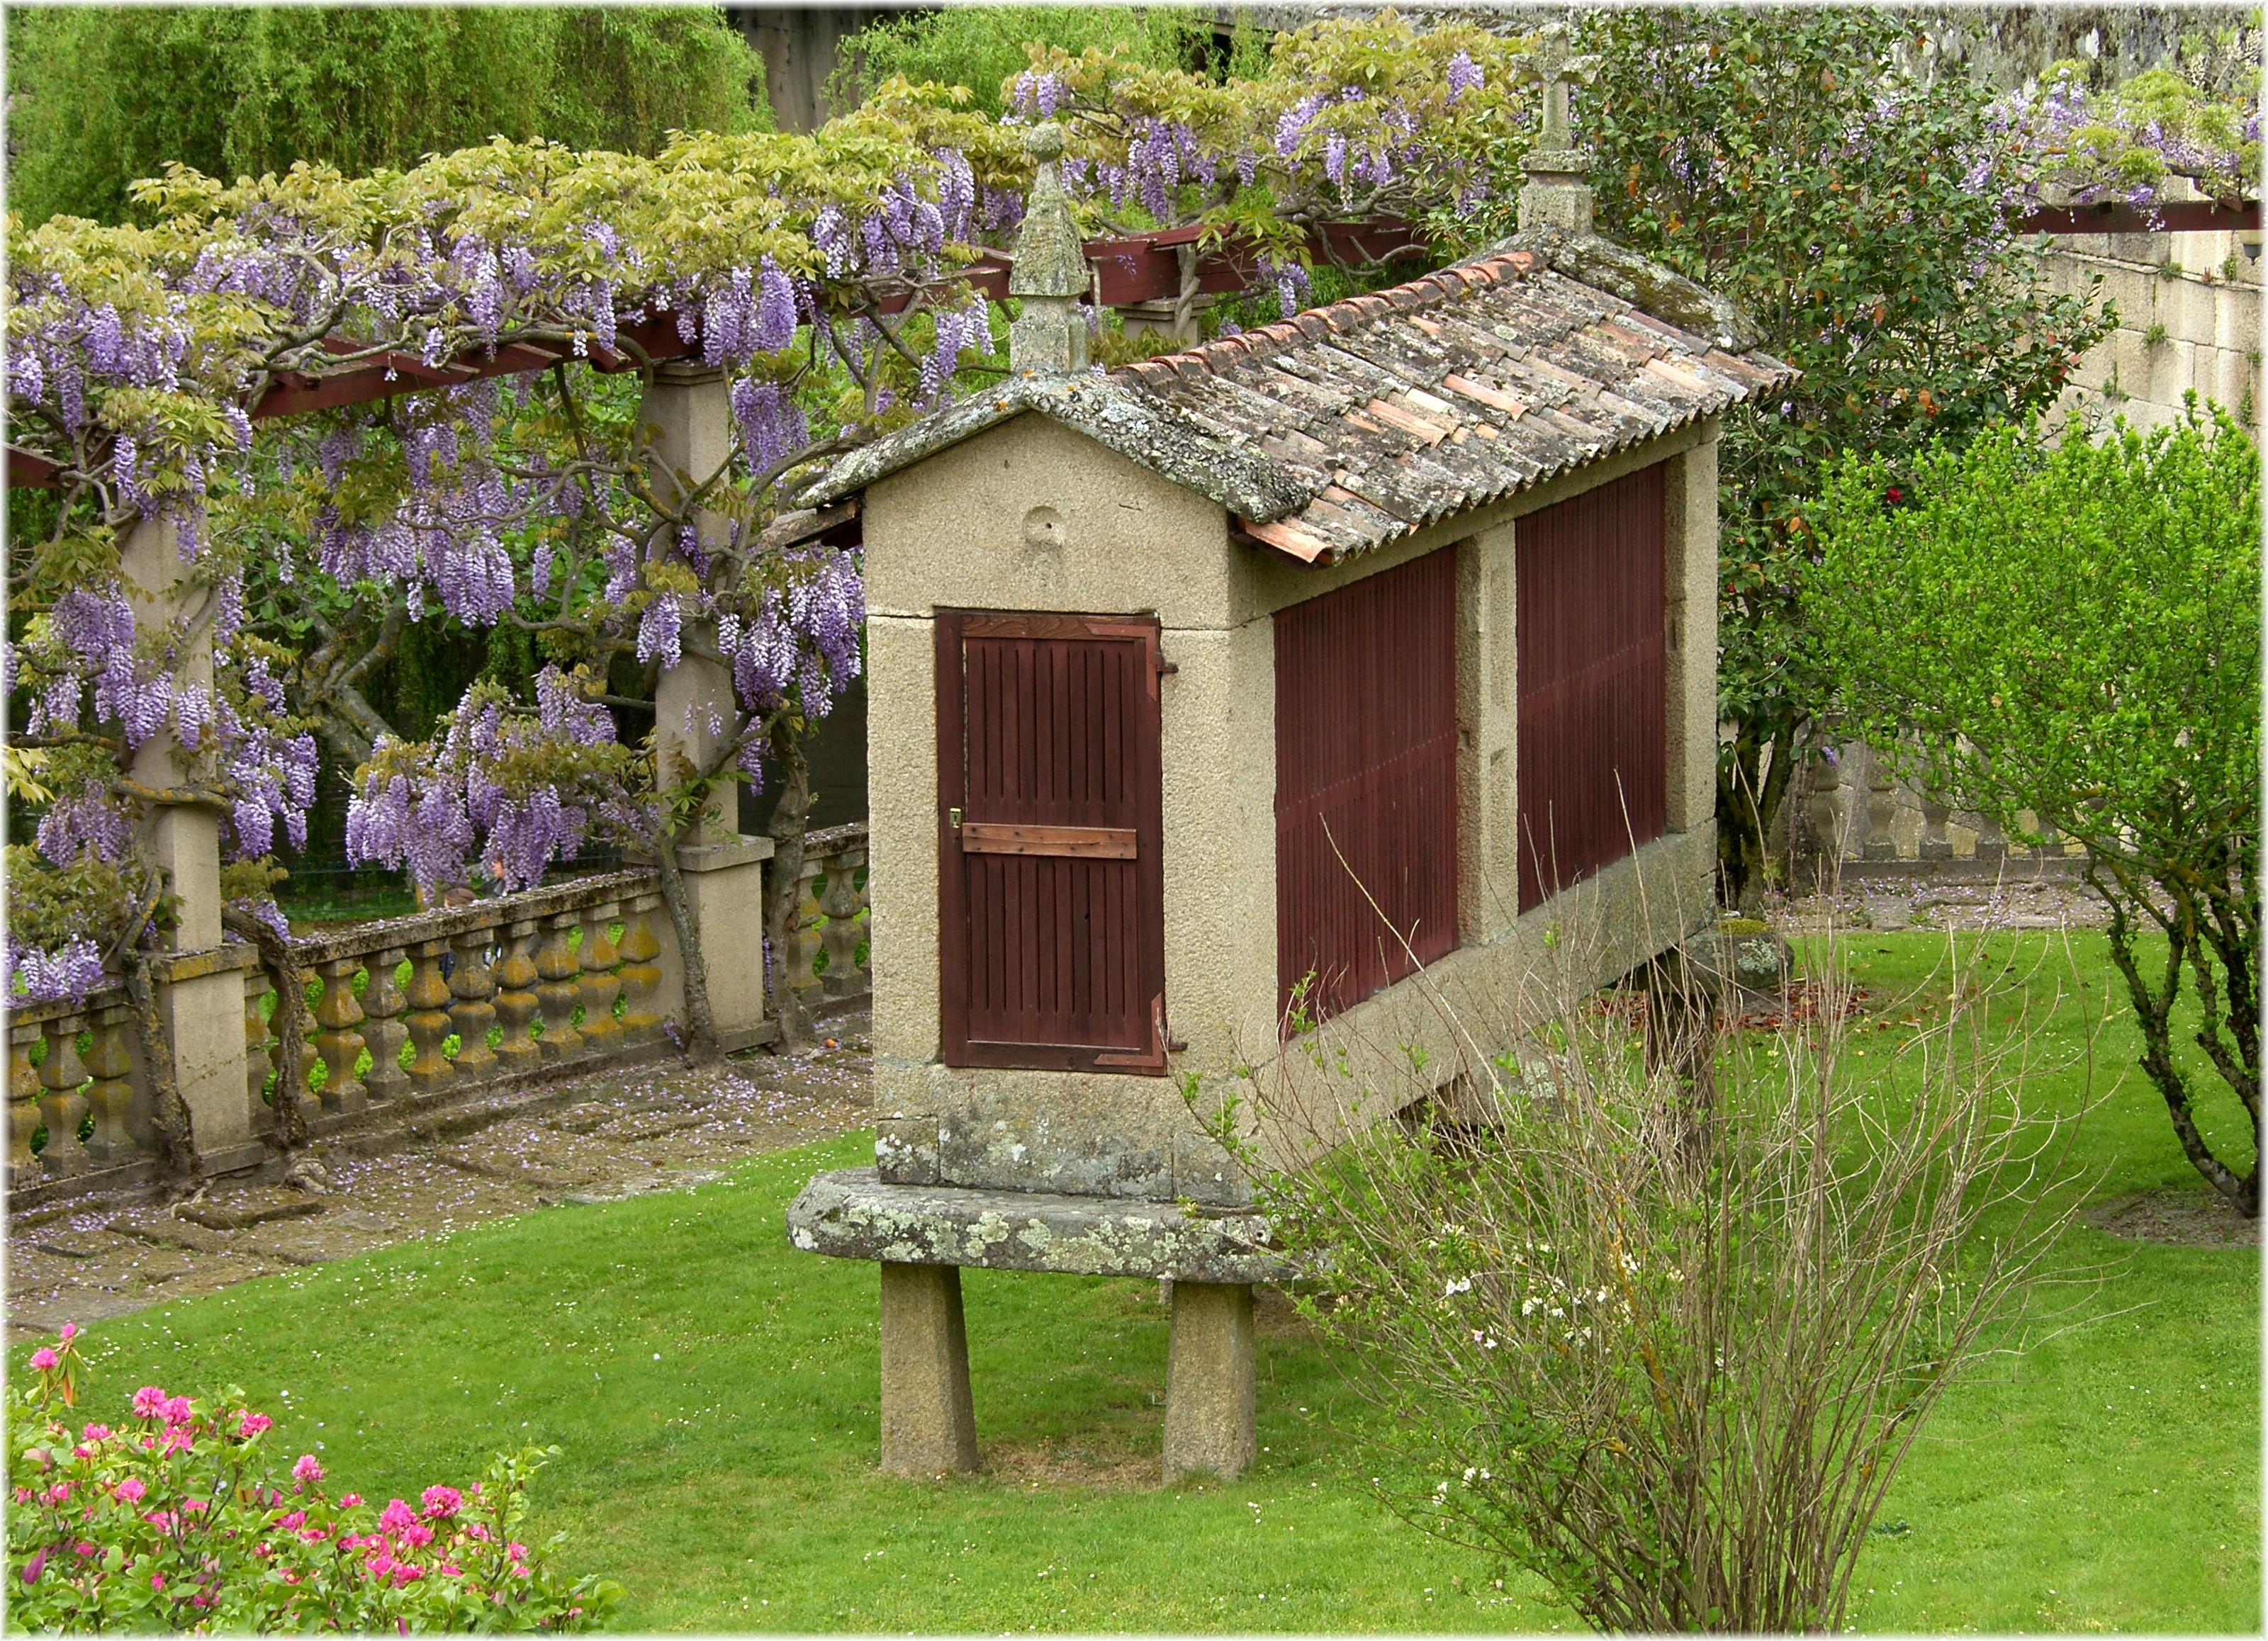 Casas piedra galicia antigua casa de campo en galicia - Casas de piedra galicia ...